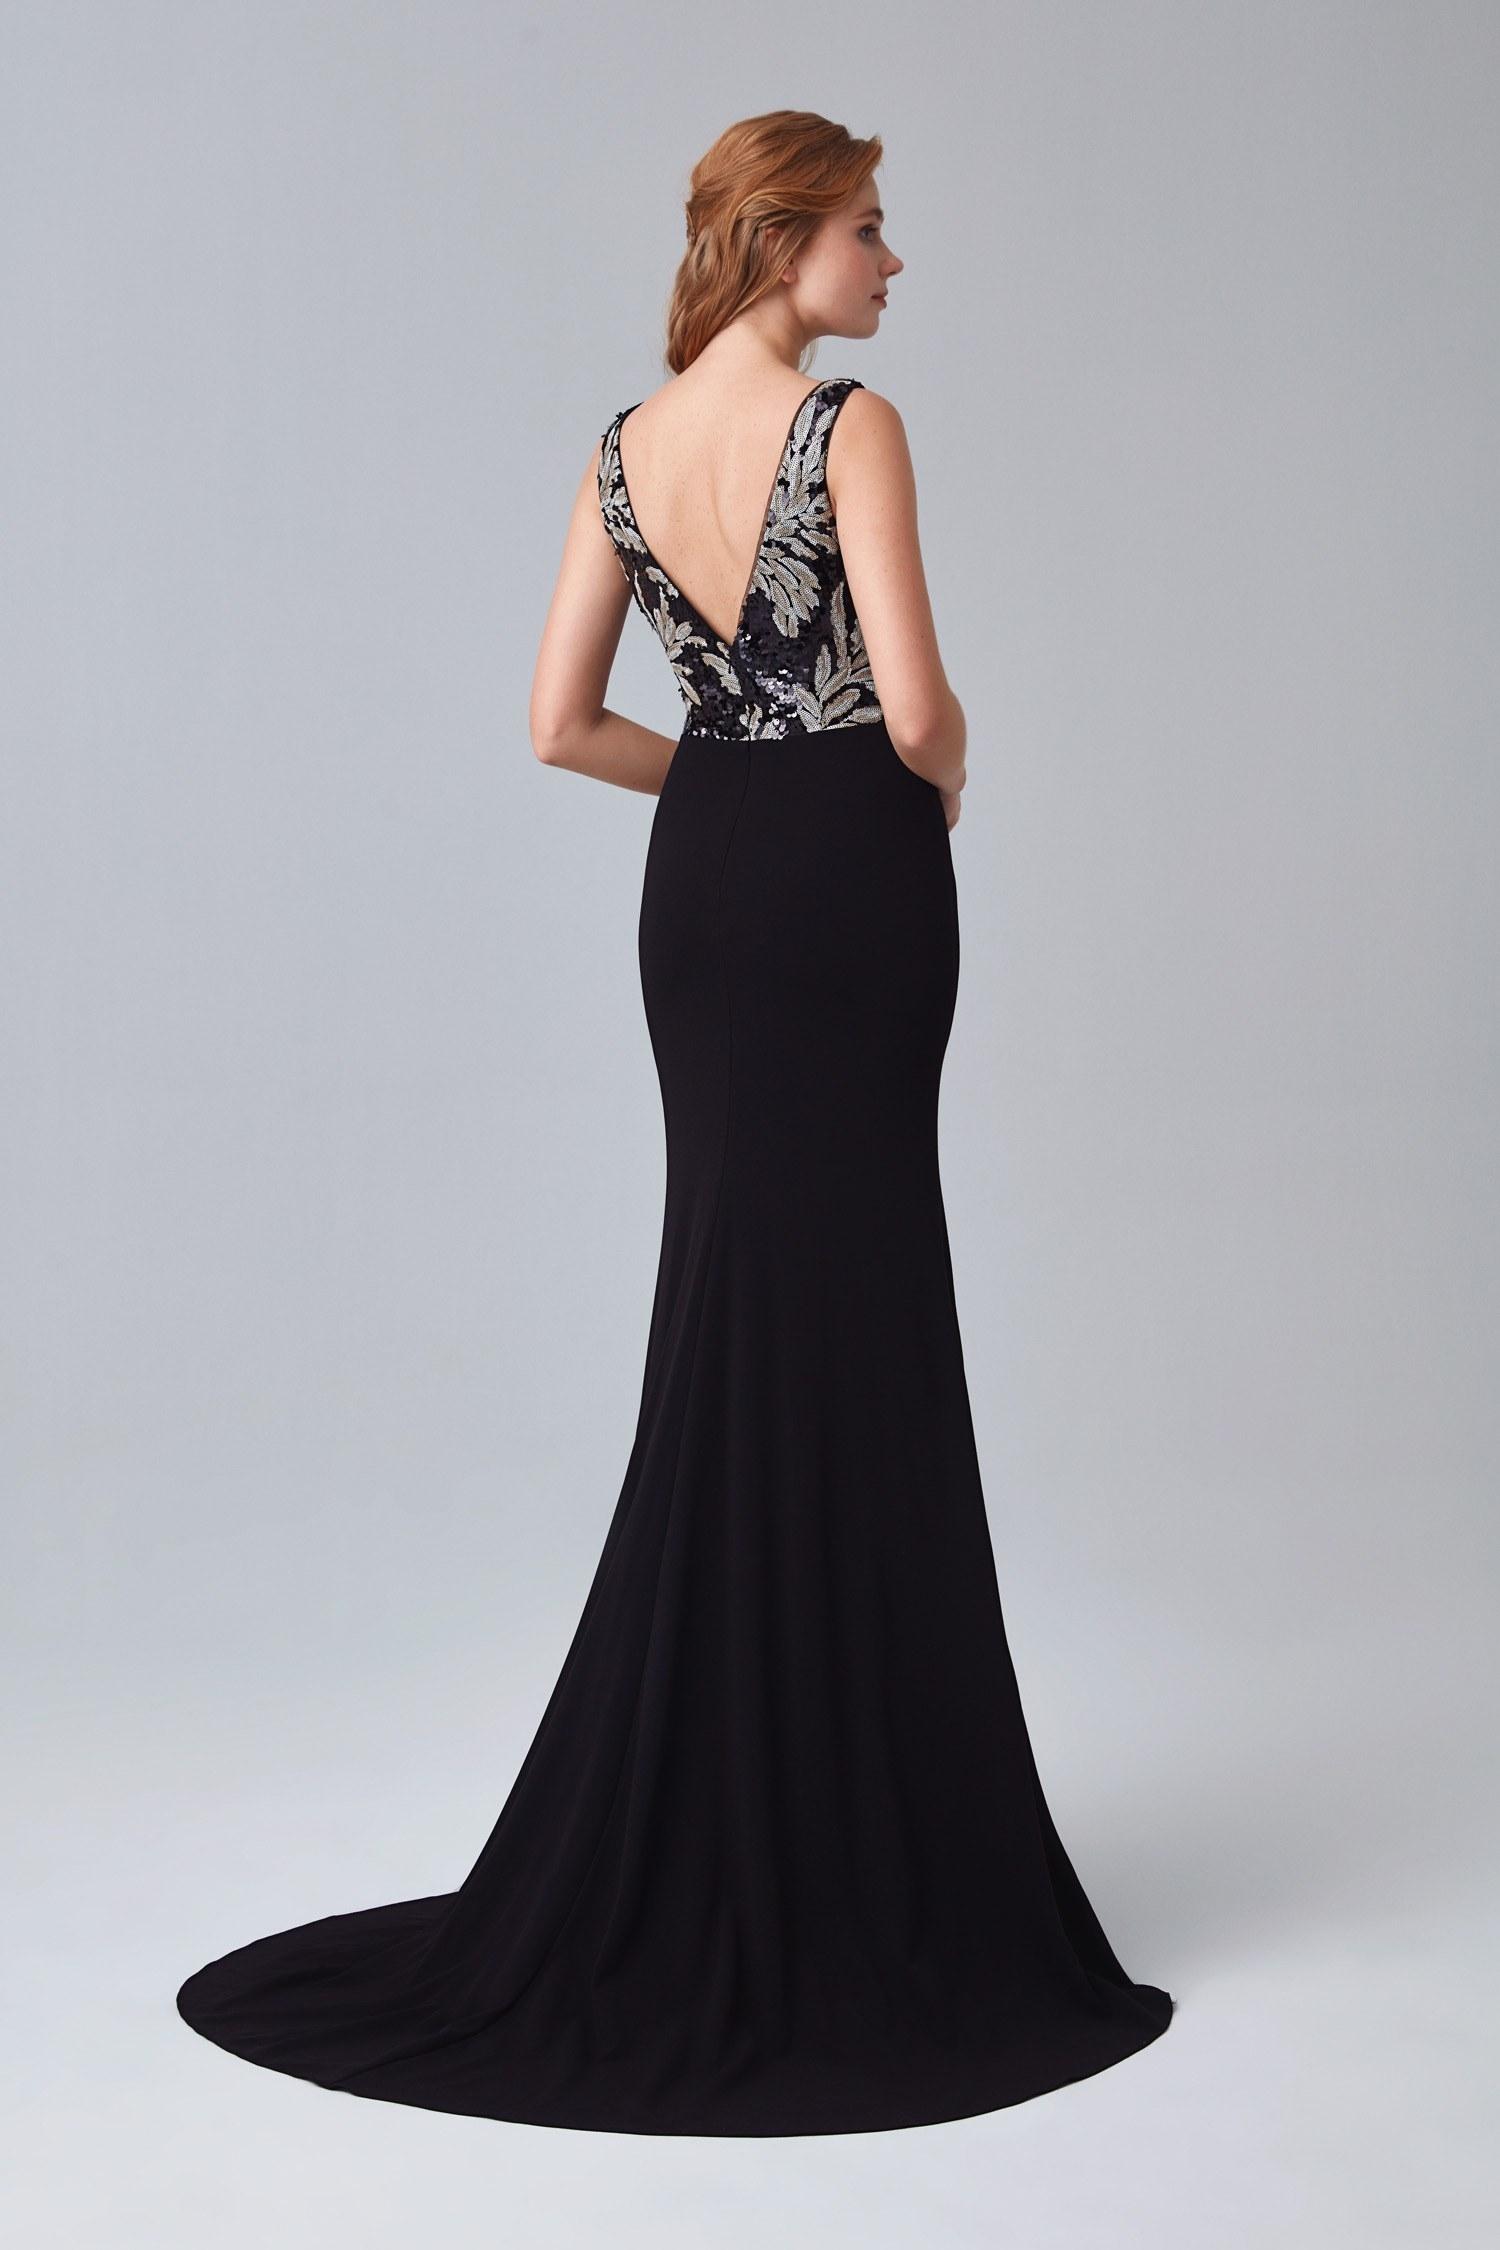 Siyah İllüzyon Yaka Payetli Uzun Abiye Elbise - Thumbnail